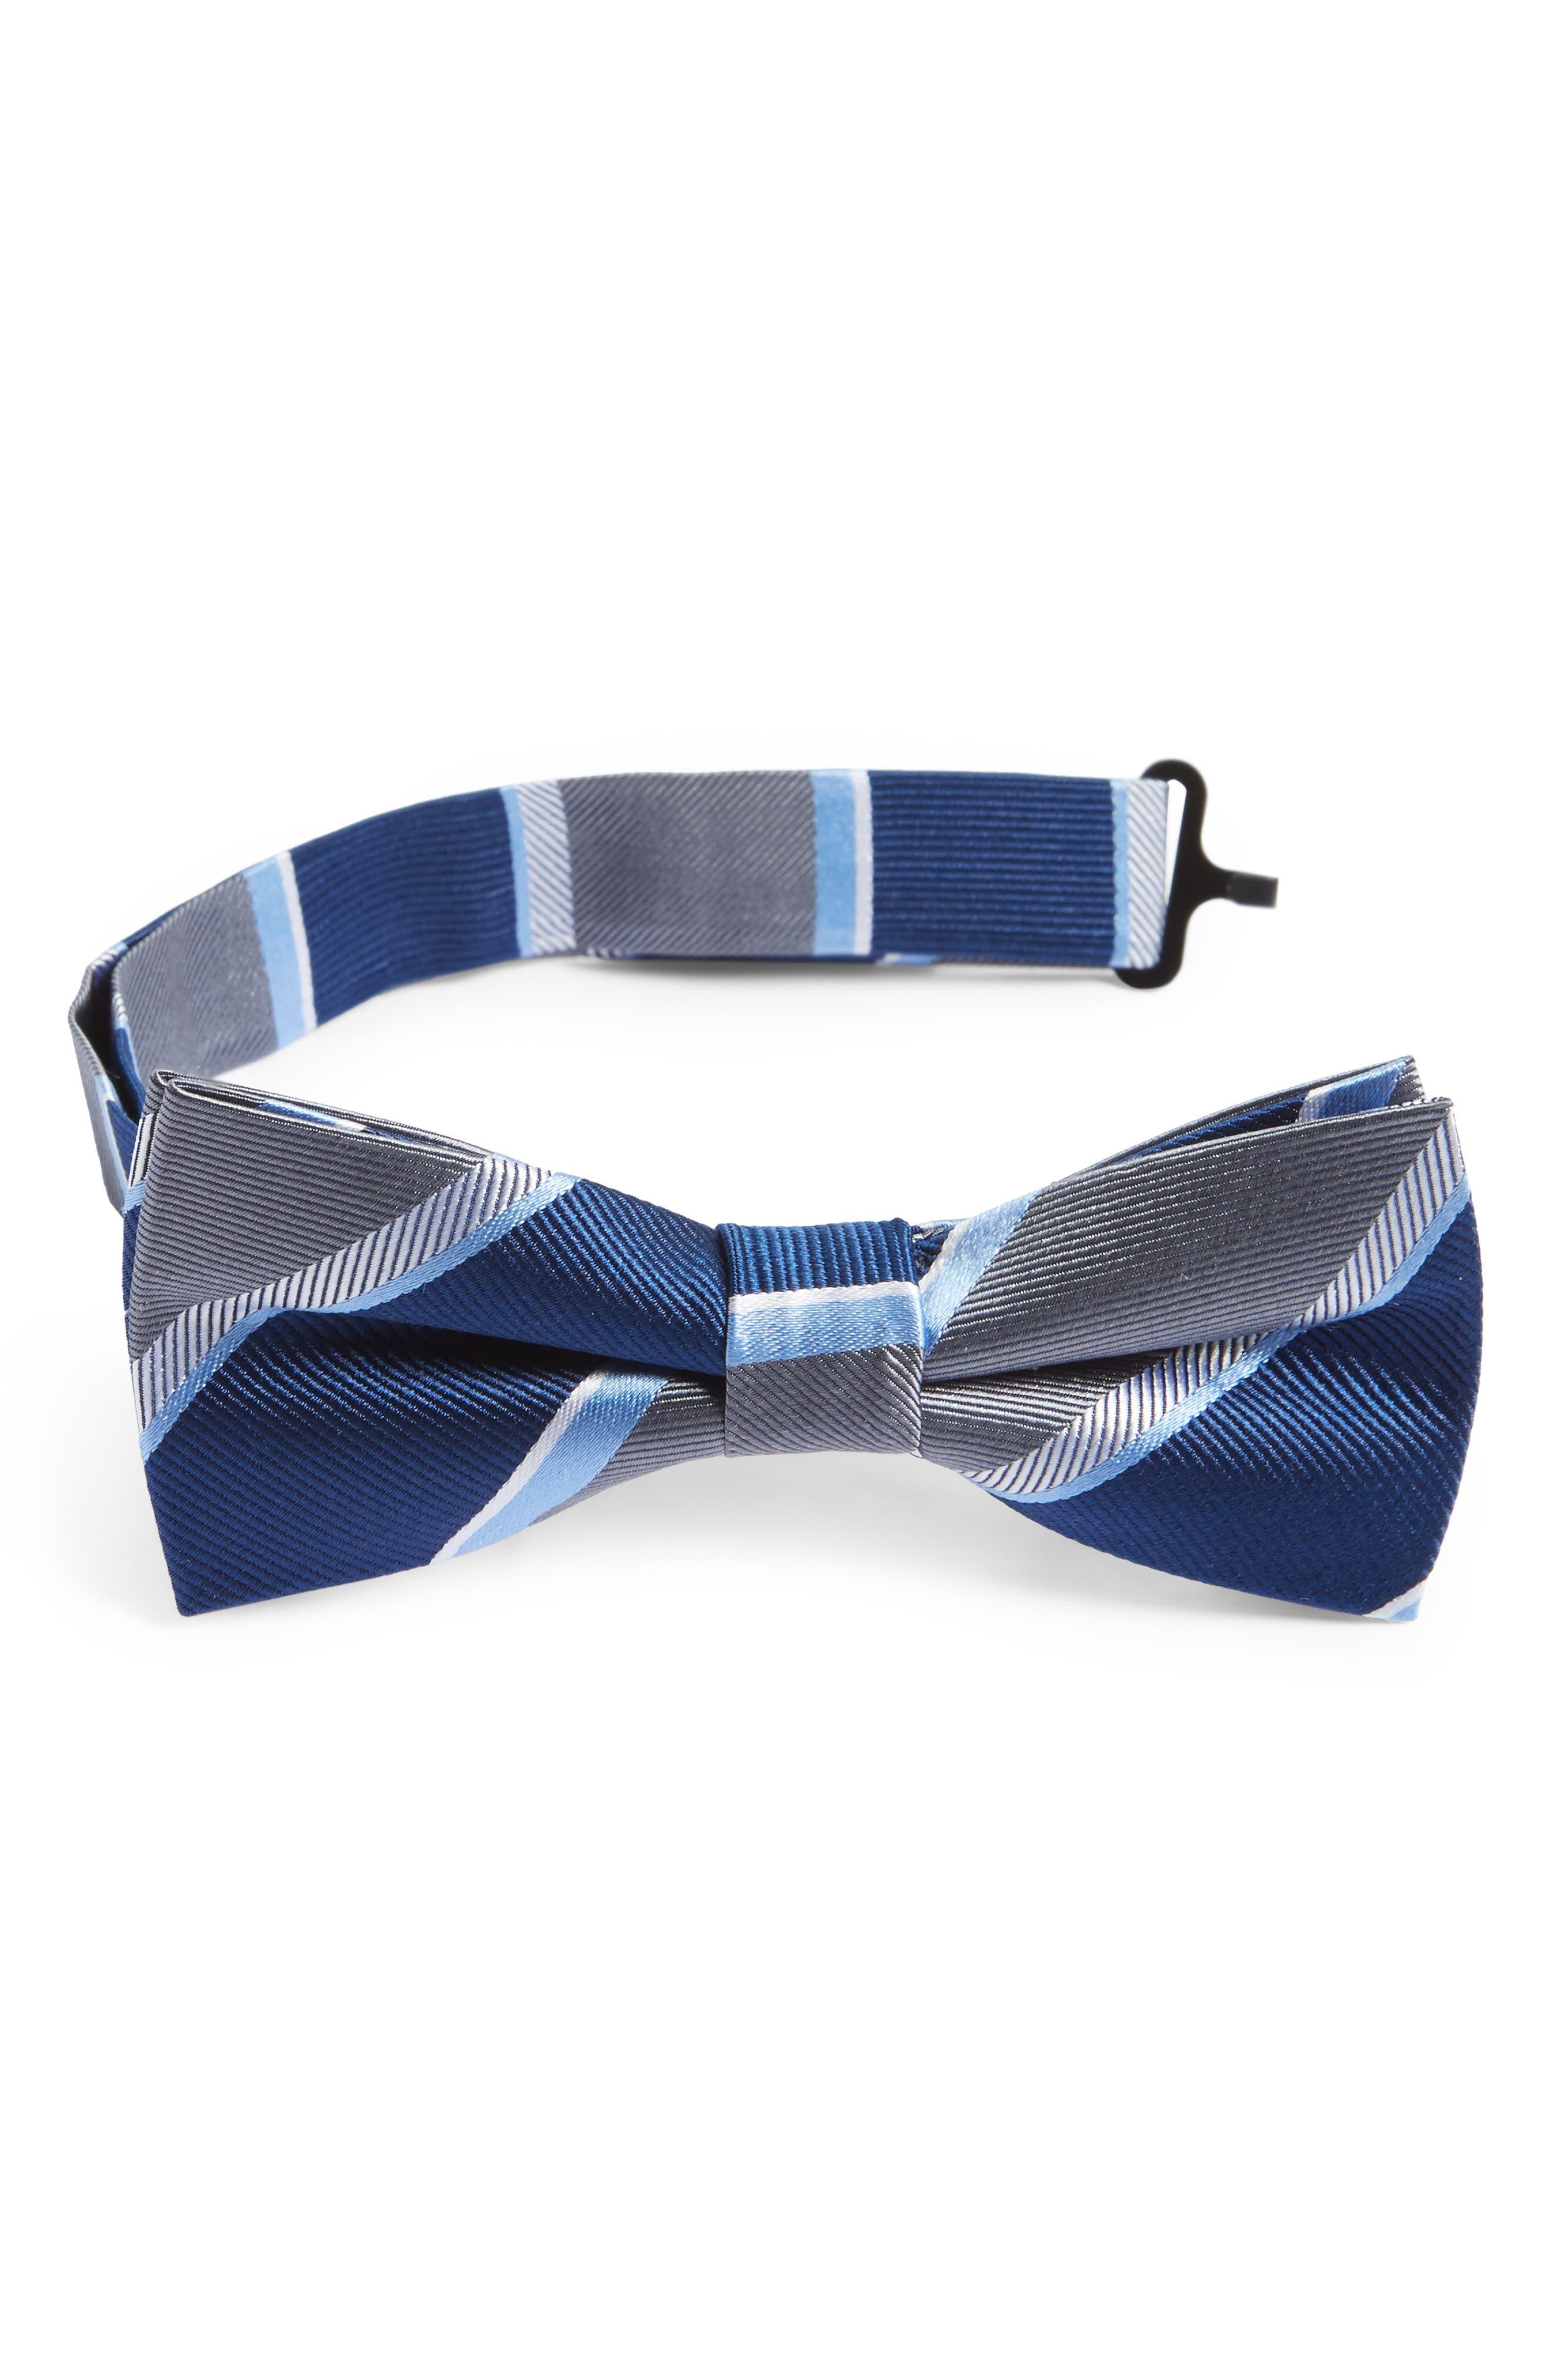 Alternate Image 1 Selected - Nordstrom Stripe Silk Bow Tie (Boys)